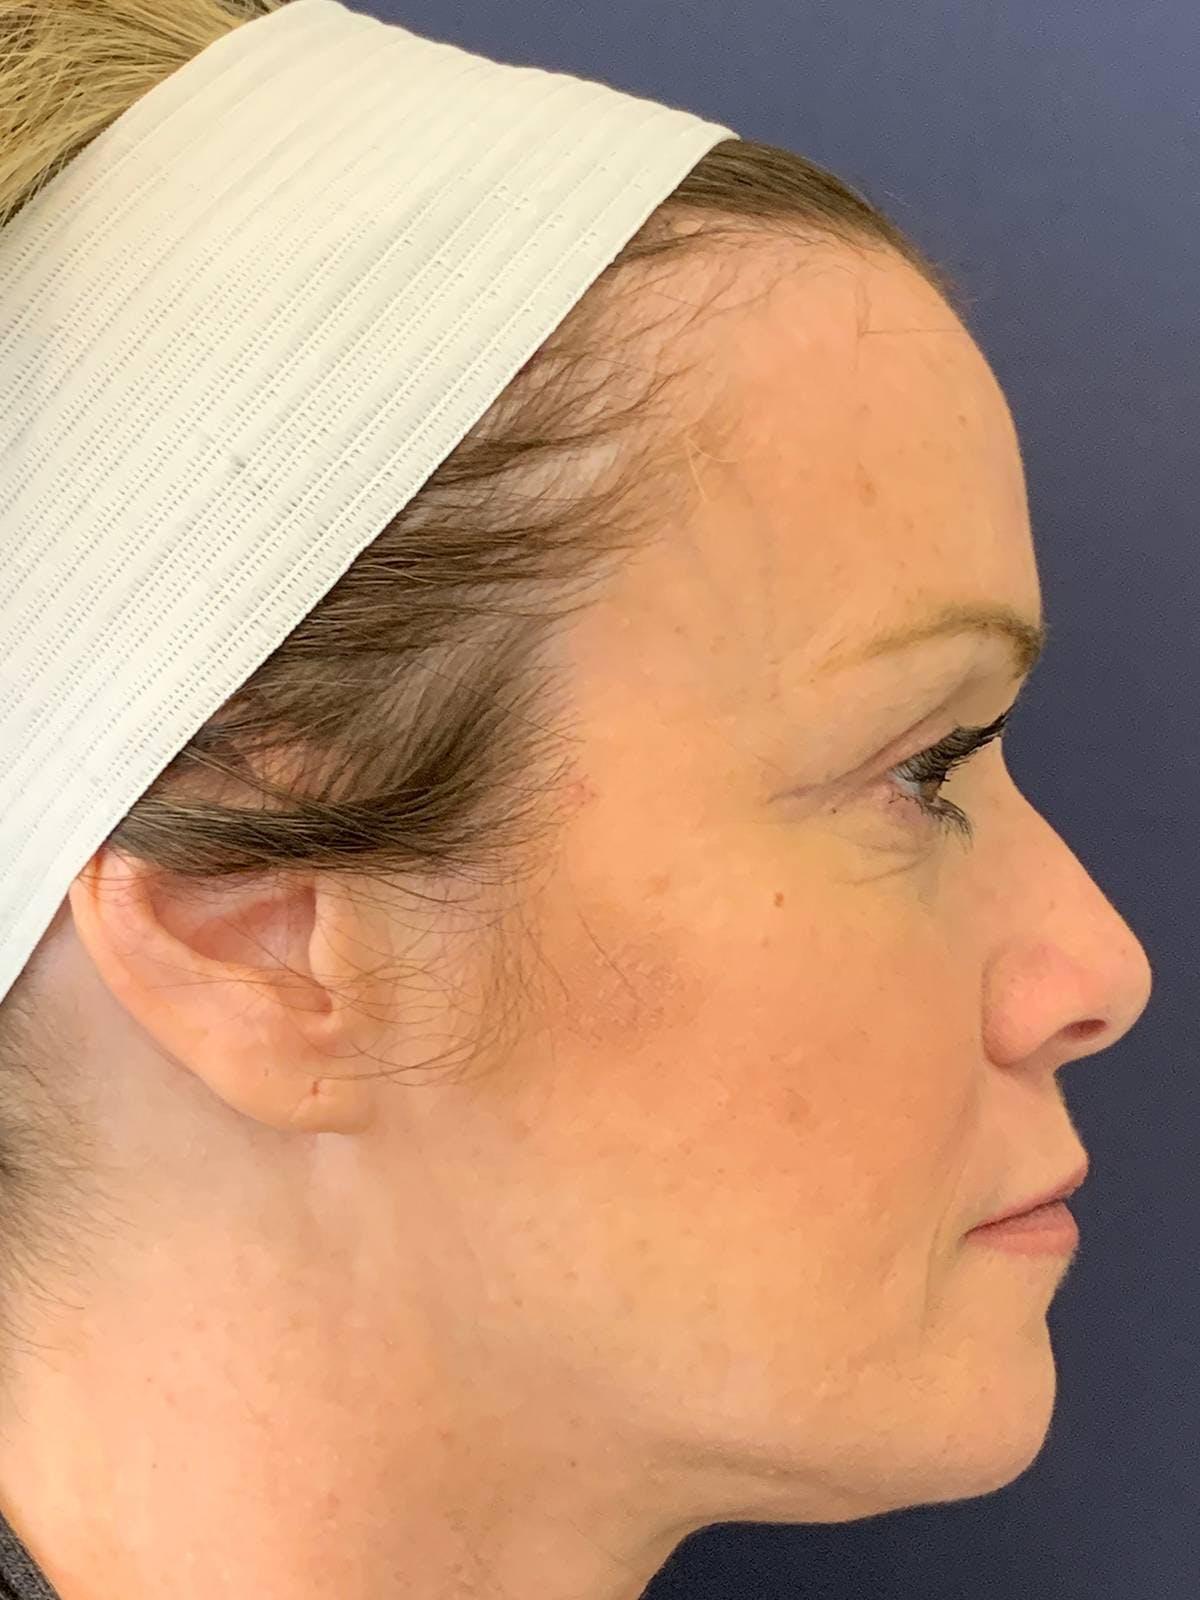 Blepharoplasty (Eyelid Surgery) Gallery - Patient 4447876 - Image 6